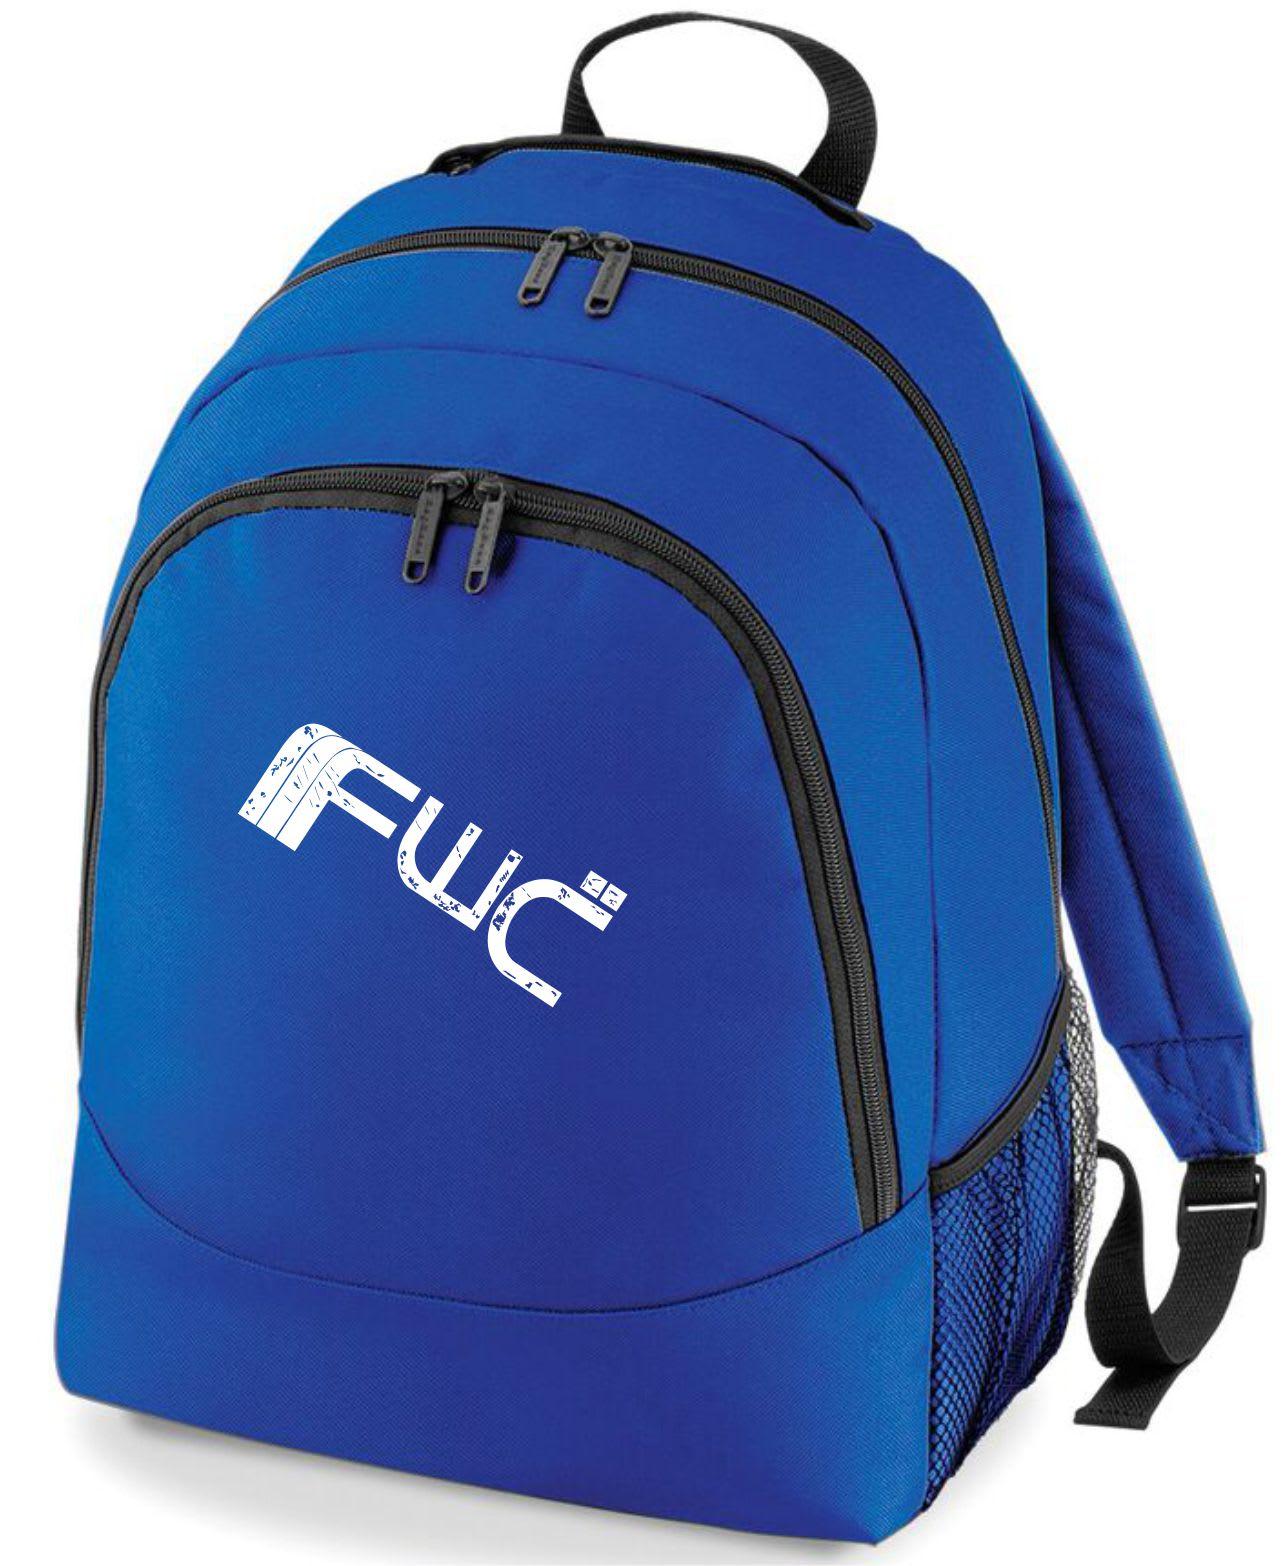 FWC Rucksack Bag